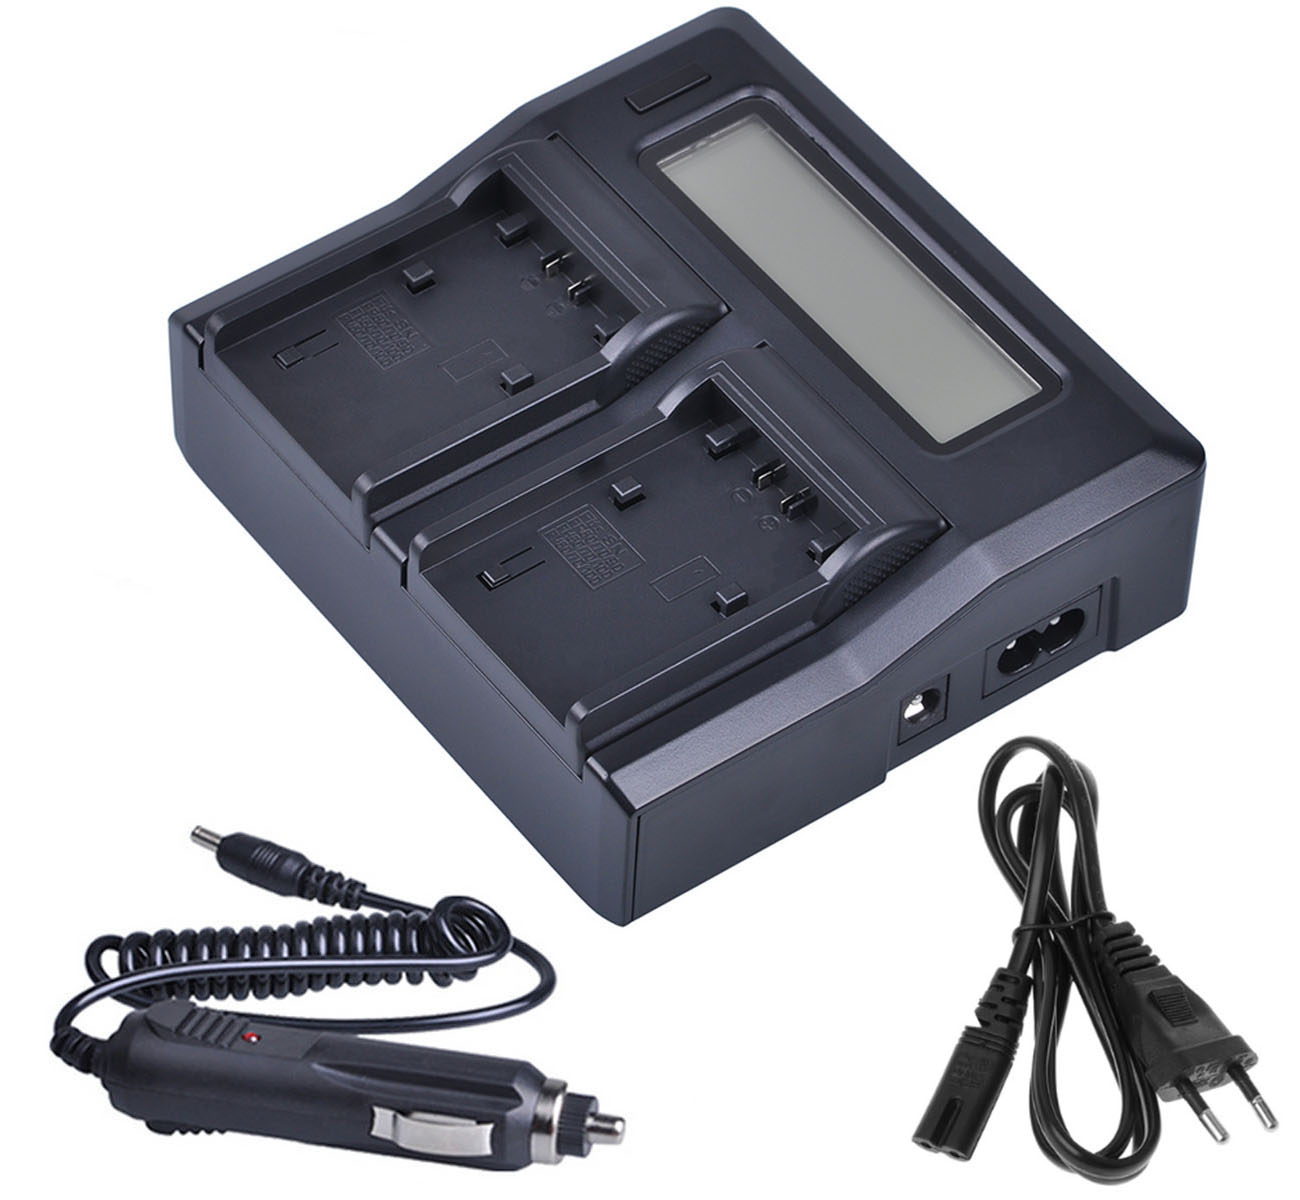 VG900 Replacement NP-FV100 Li-Ion Camcorder Battery for Digital Recording Binoculars DEV-3 DEV-5 Sony Handycam NEX-VG10 VG20 VG20H